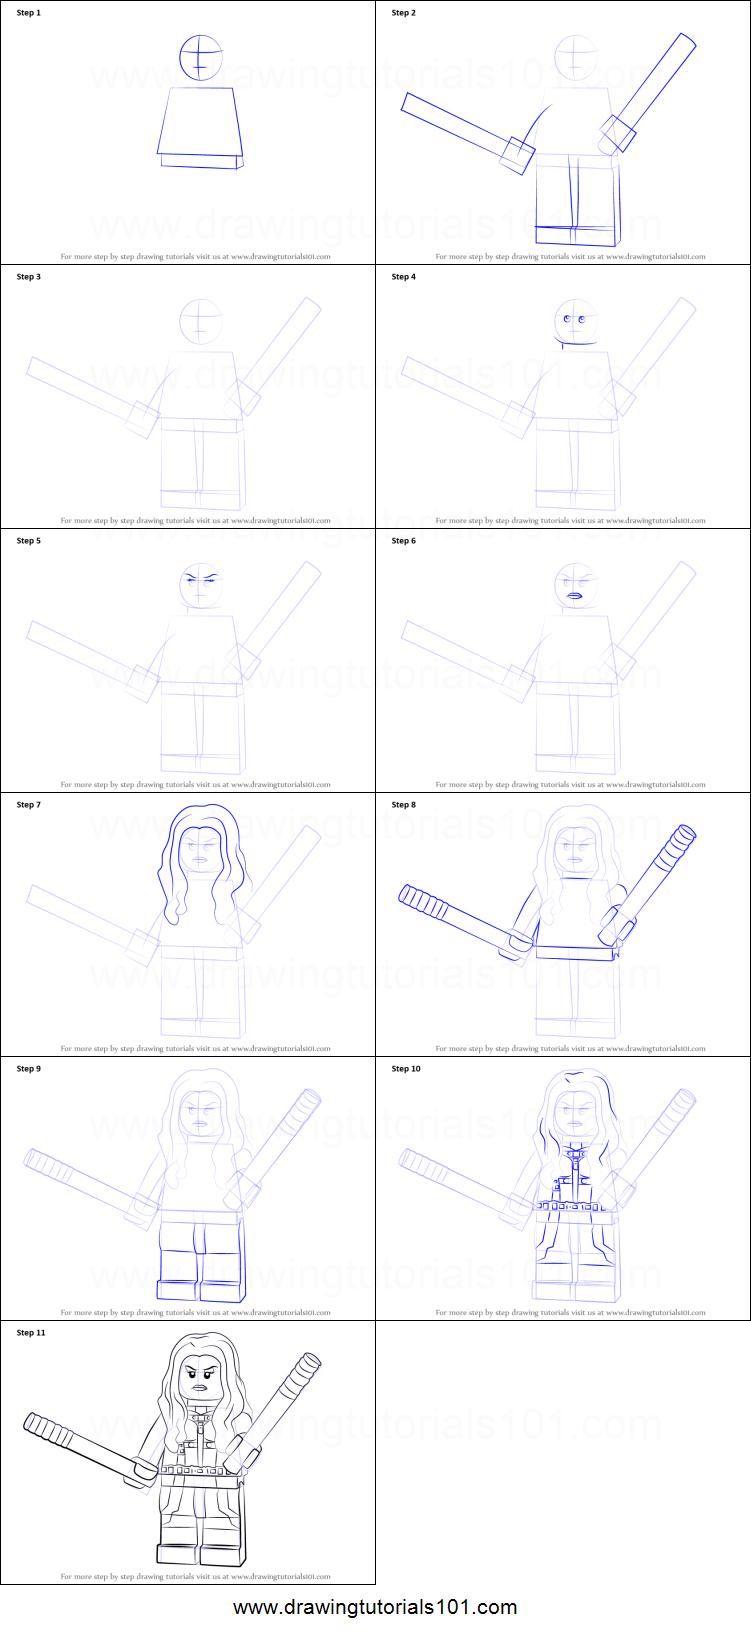 Draw Drawing Drawingtutorials1 Lego Mockingbird Printable Sheet How To Draw Lego Mockingbird Printable In 2020 Drawing Sheet Sharpie Paint Markers Sharpie Paint